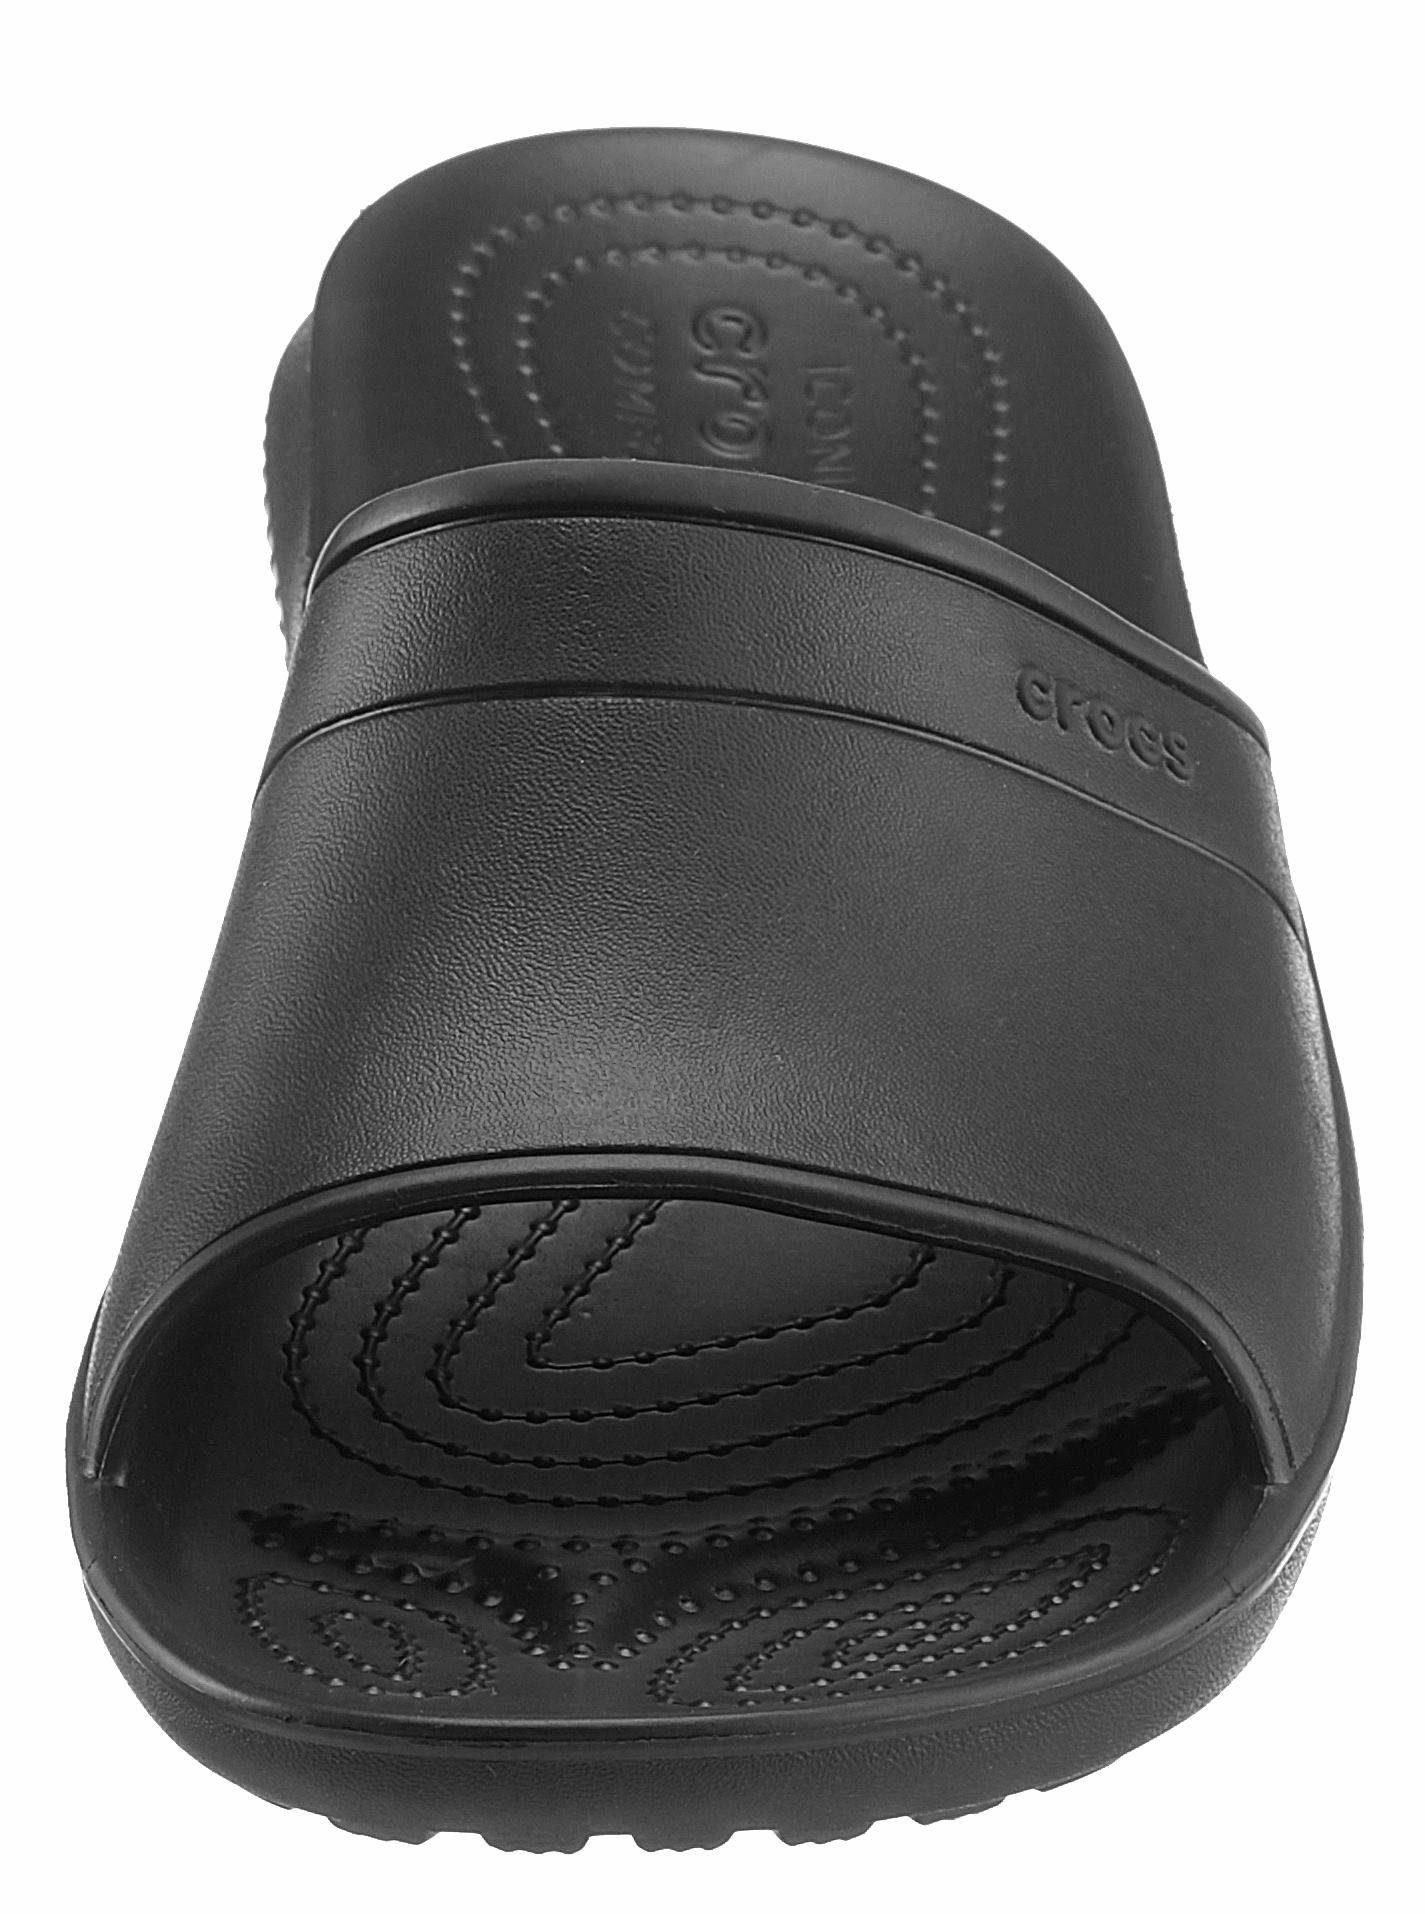 Crocs Classic Slide Pantolette, Leichtgewicht  schwarz